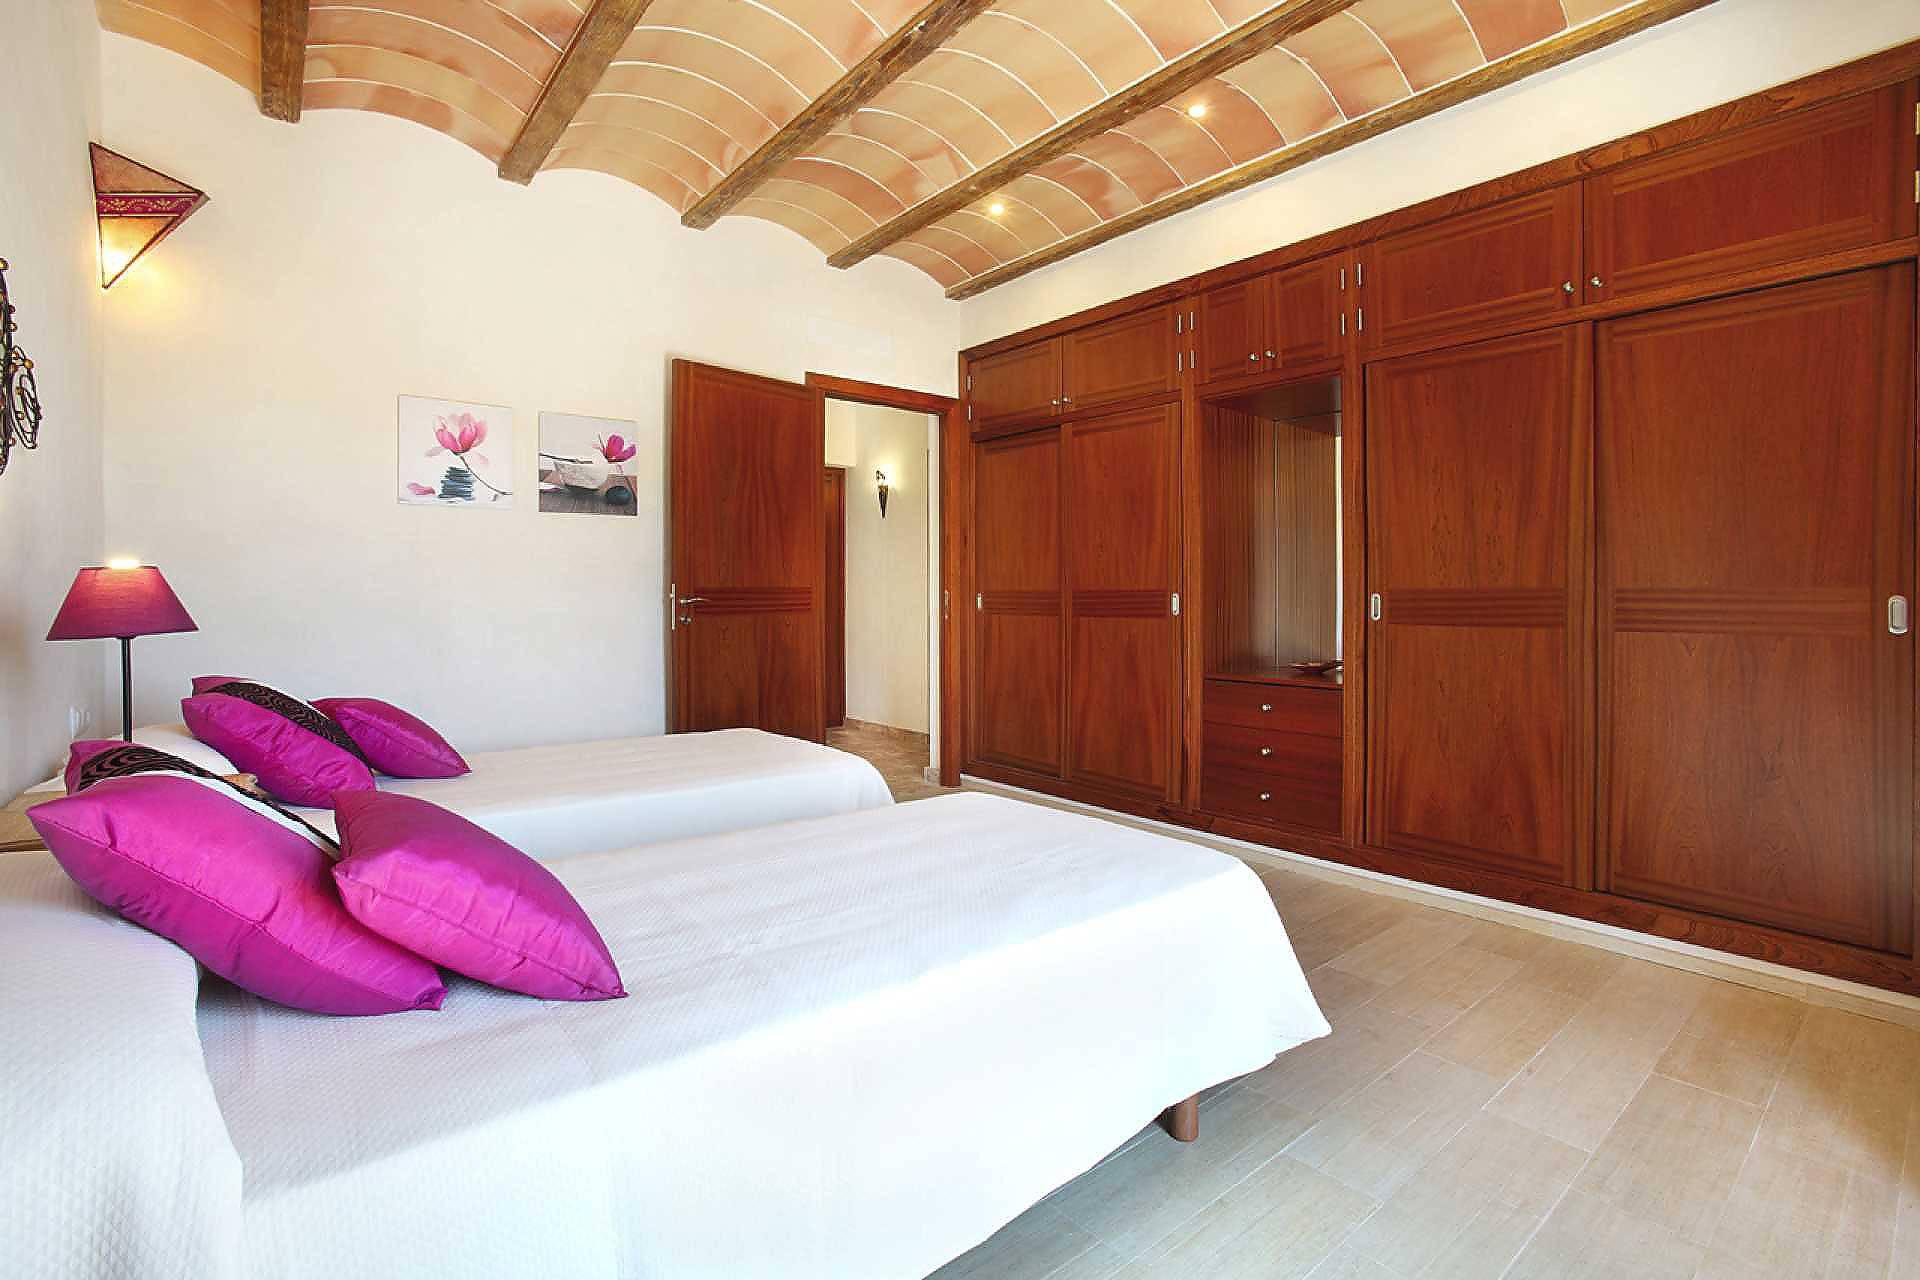 01-45 Exclusive Finca Mallorca East Bild 40